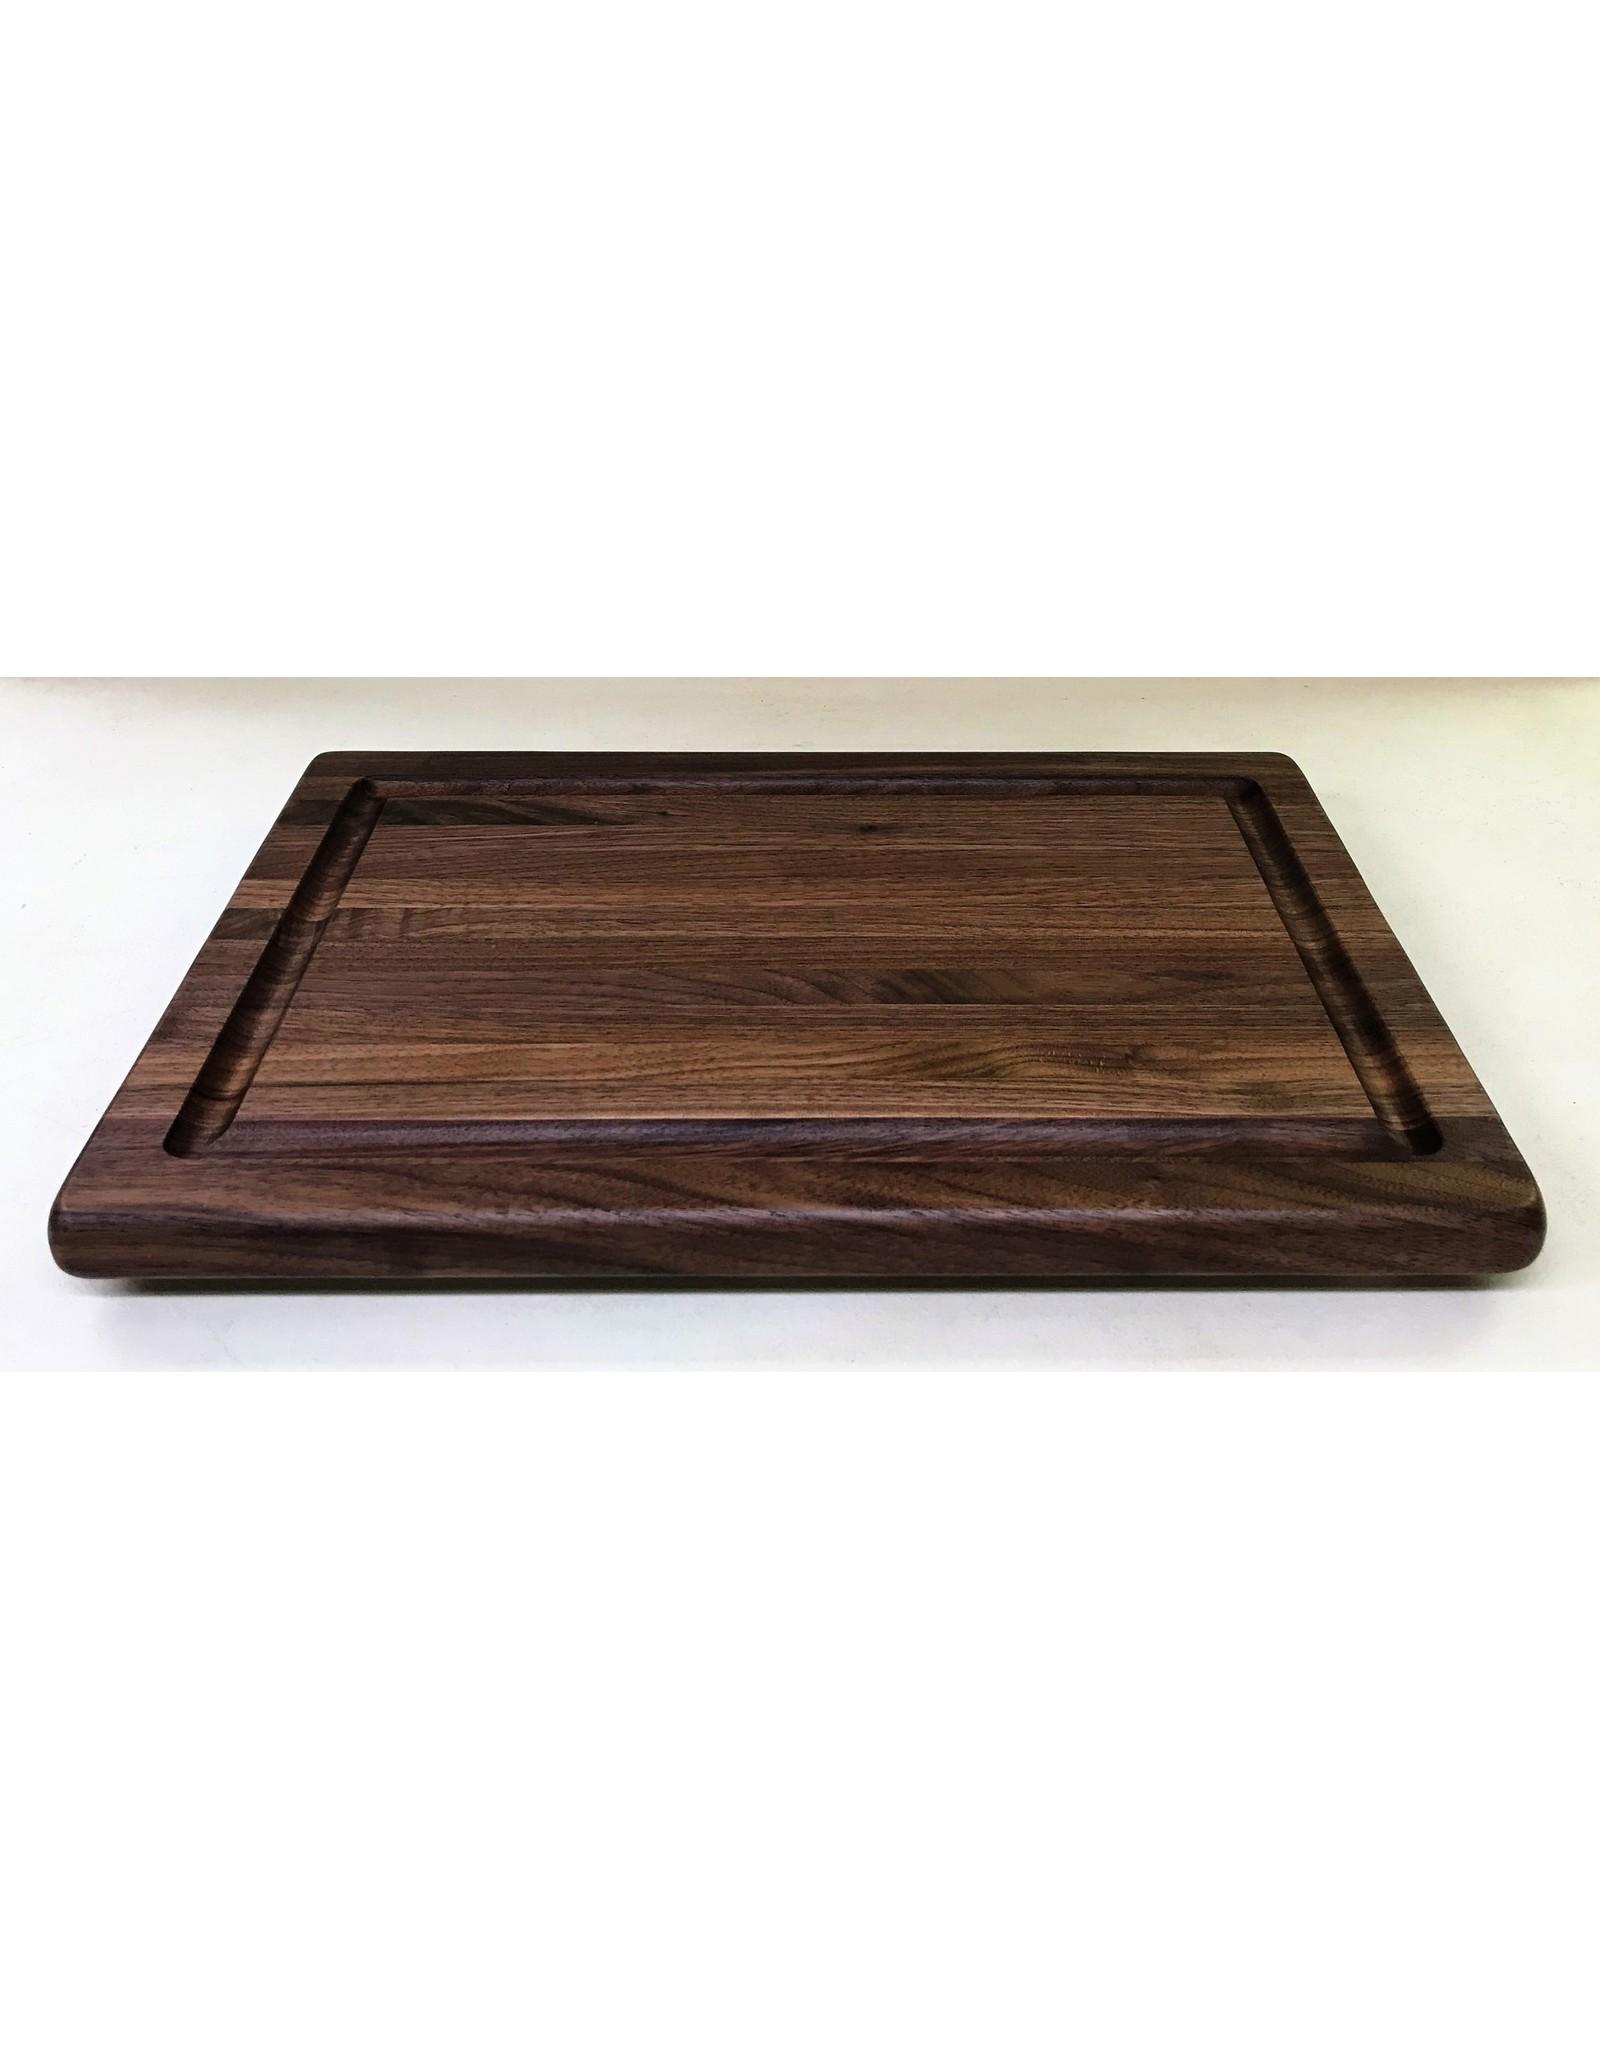 Richard Rose Culinary Edge Grain Walnut Cutting Board with juice groove